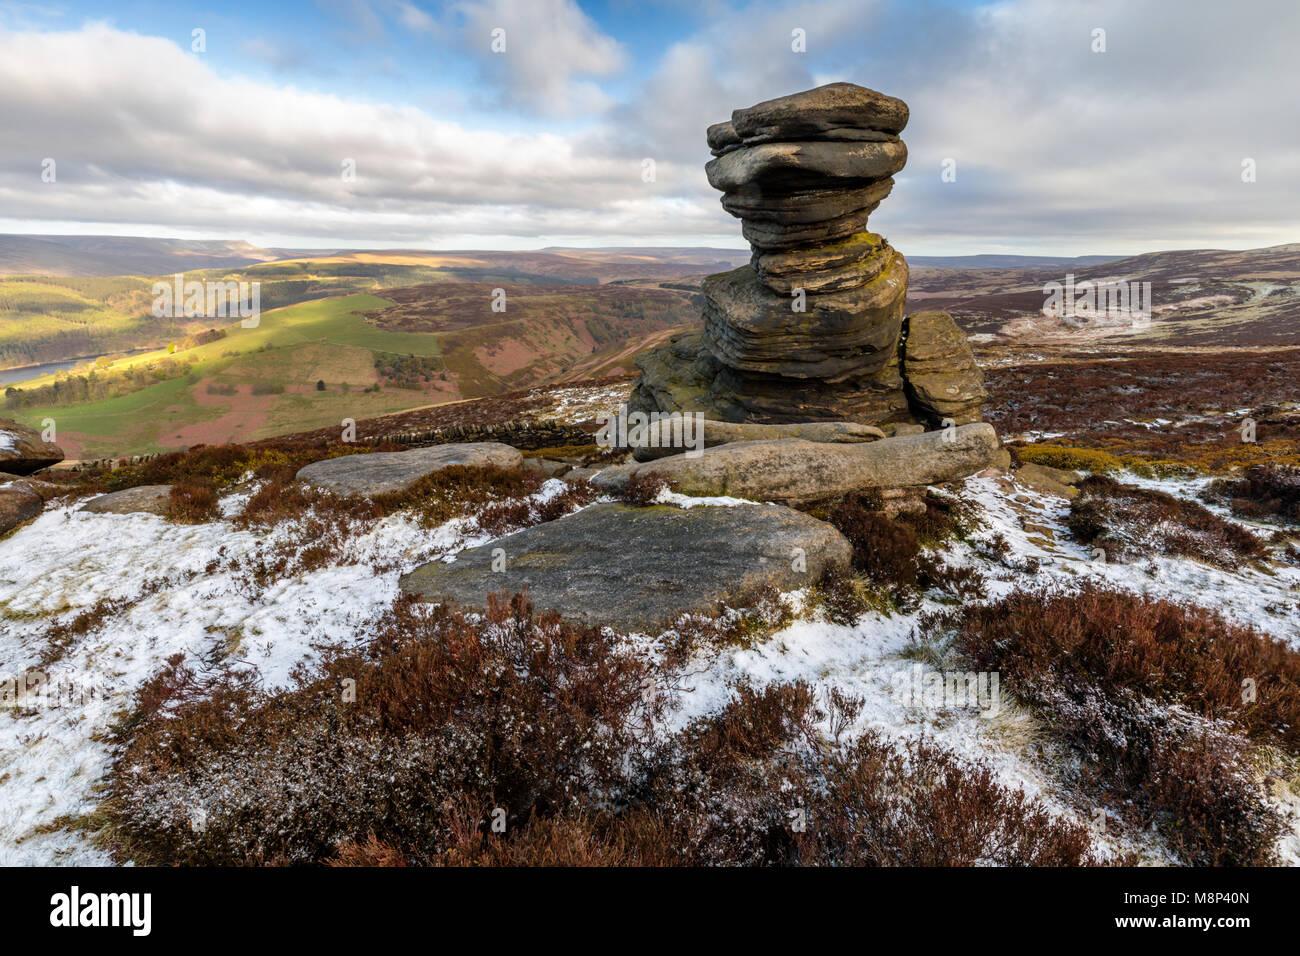 The Salt Cellar, Derwent Edge, Peak District National Park Derbyshire England UK - Stock Image